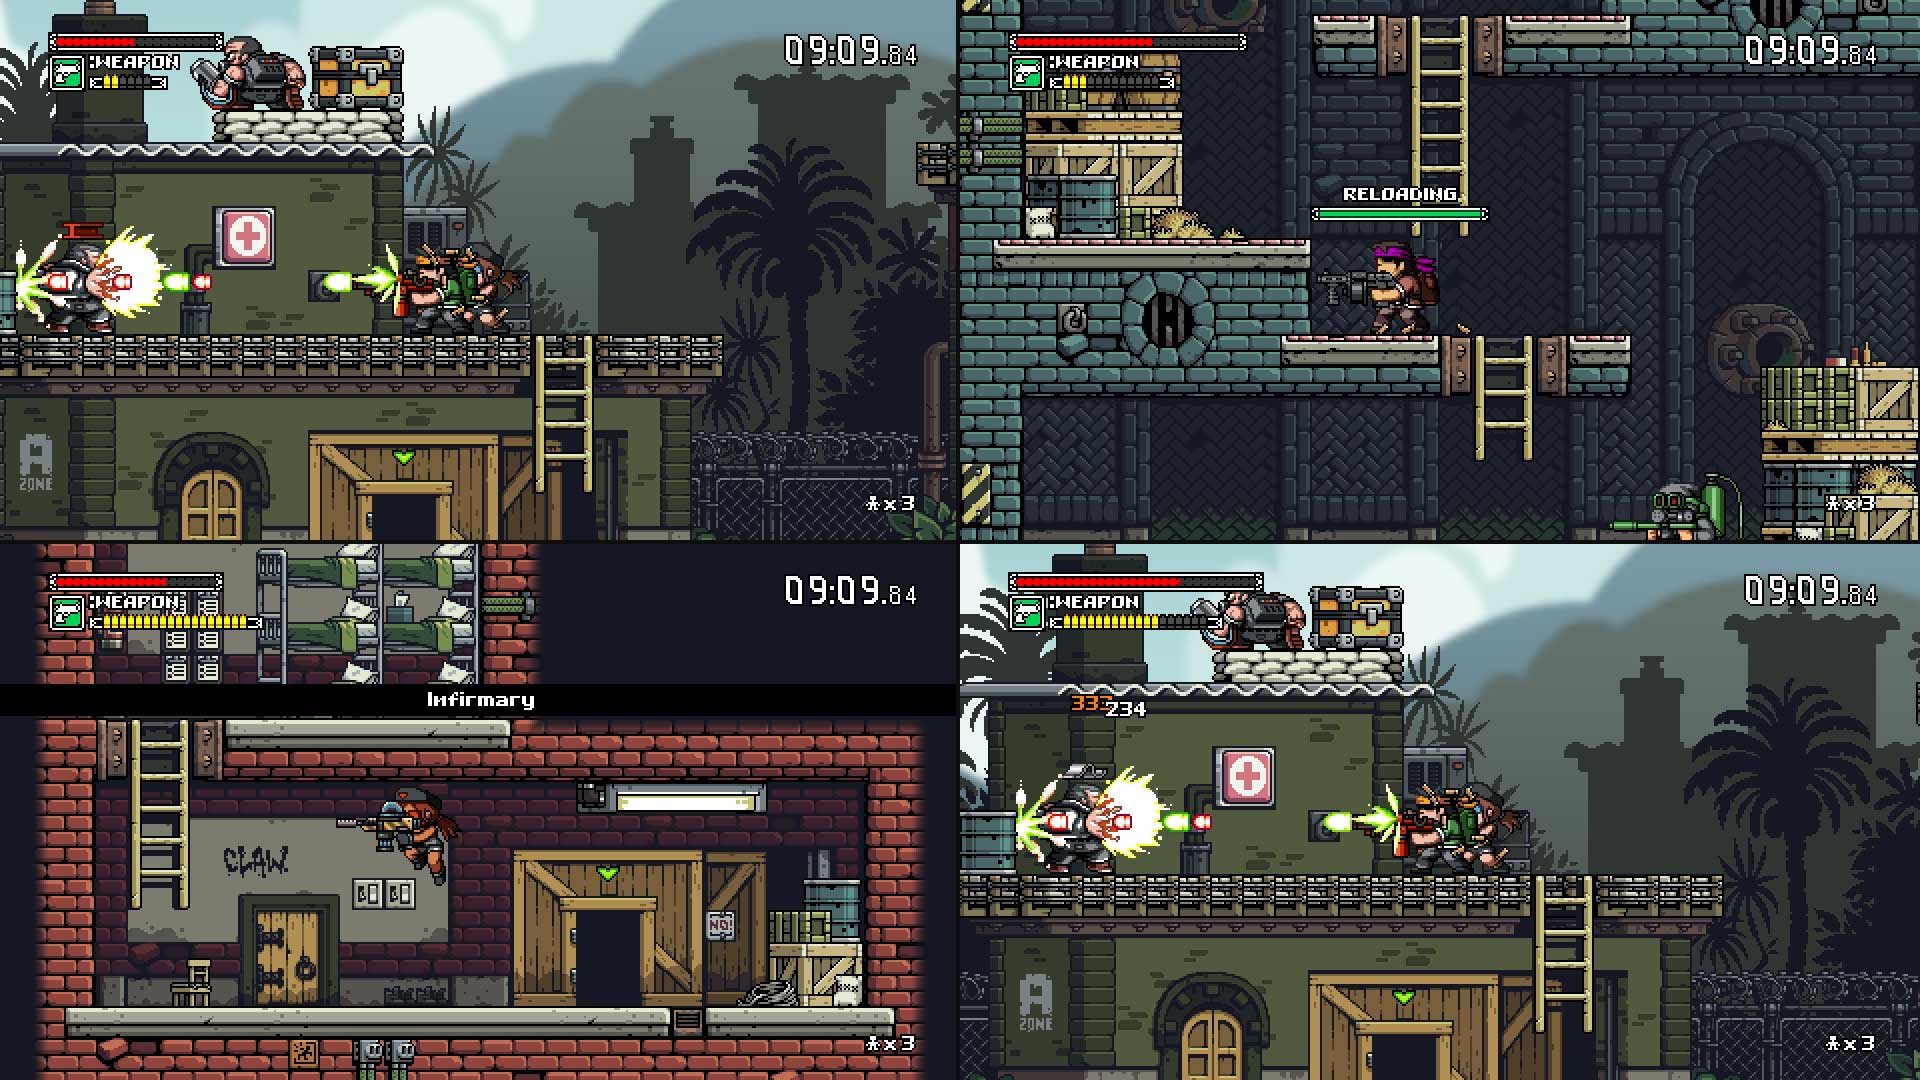 『Mercenary Kings (マーセナリーキングス)』ゲーム画面